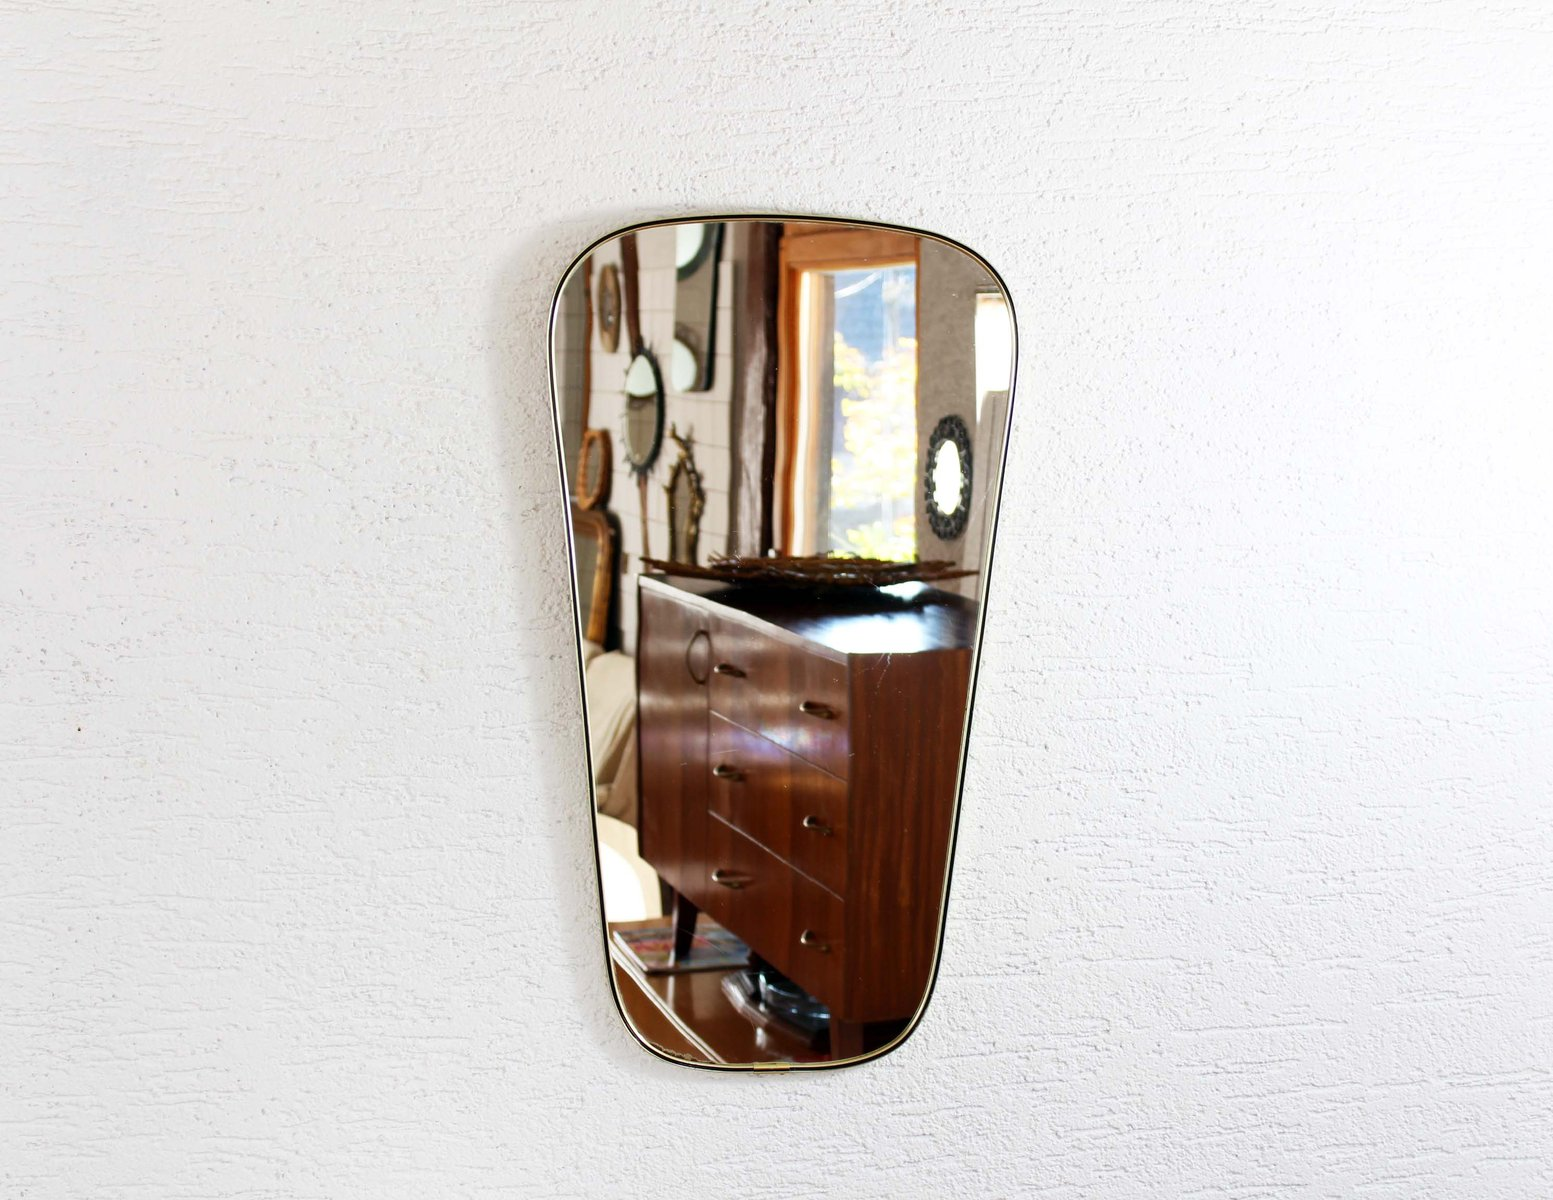 vintage spiegel 1950er bei pamono kaufen. Black Bedroom Furniture Sets. Home Design Ideas